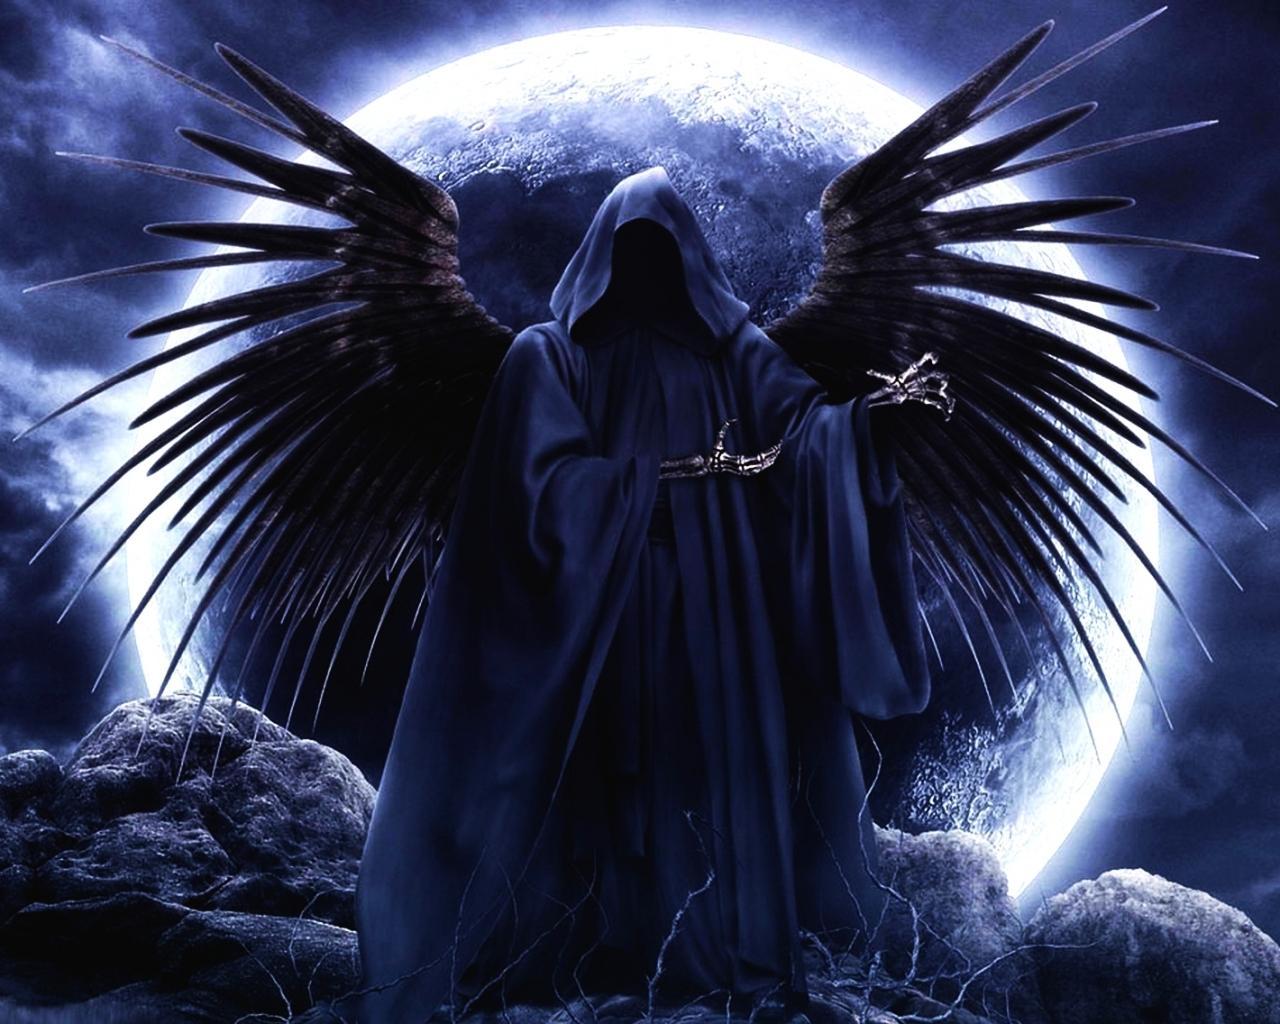 Dark angel wallpapers wallpapersafari - Dark angel anime wallpaper ...